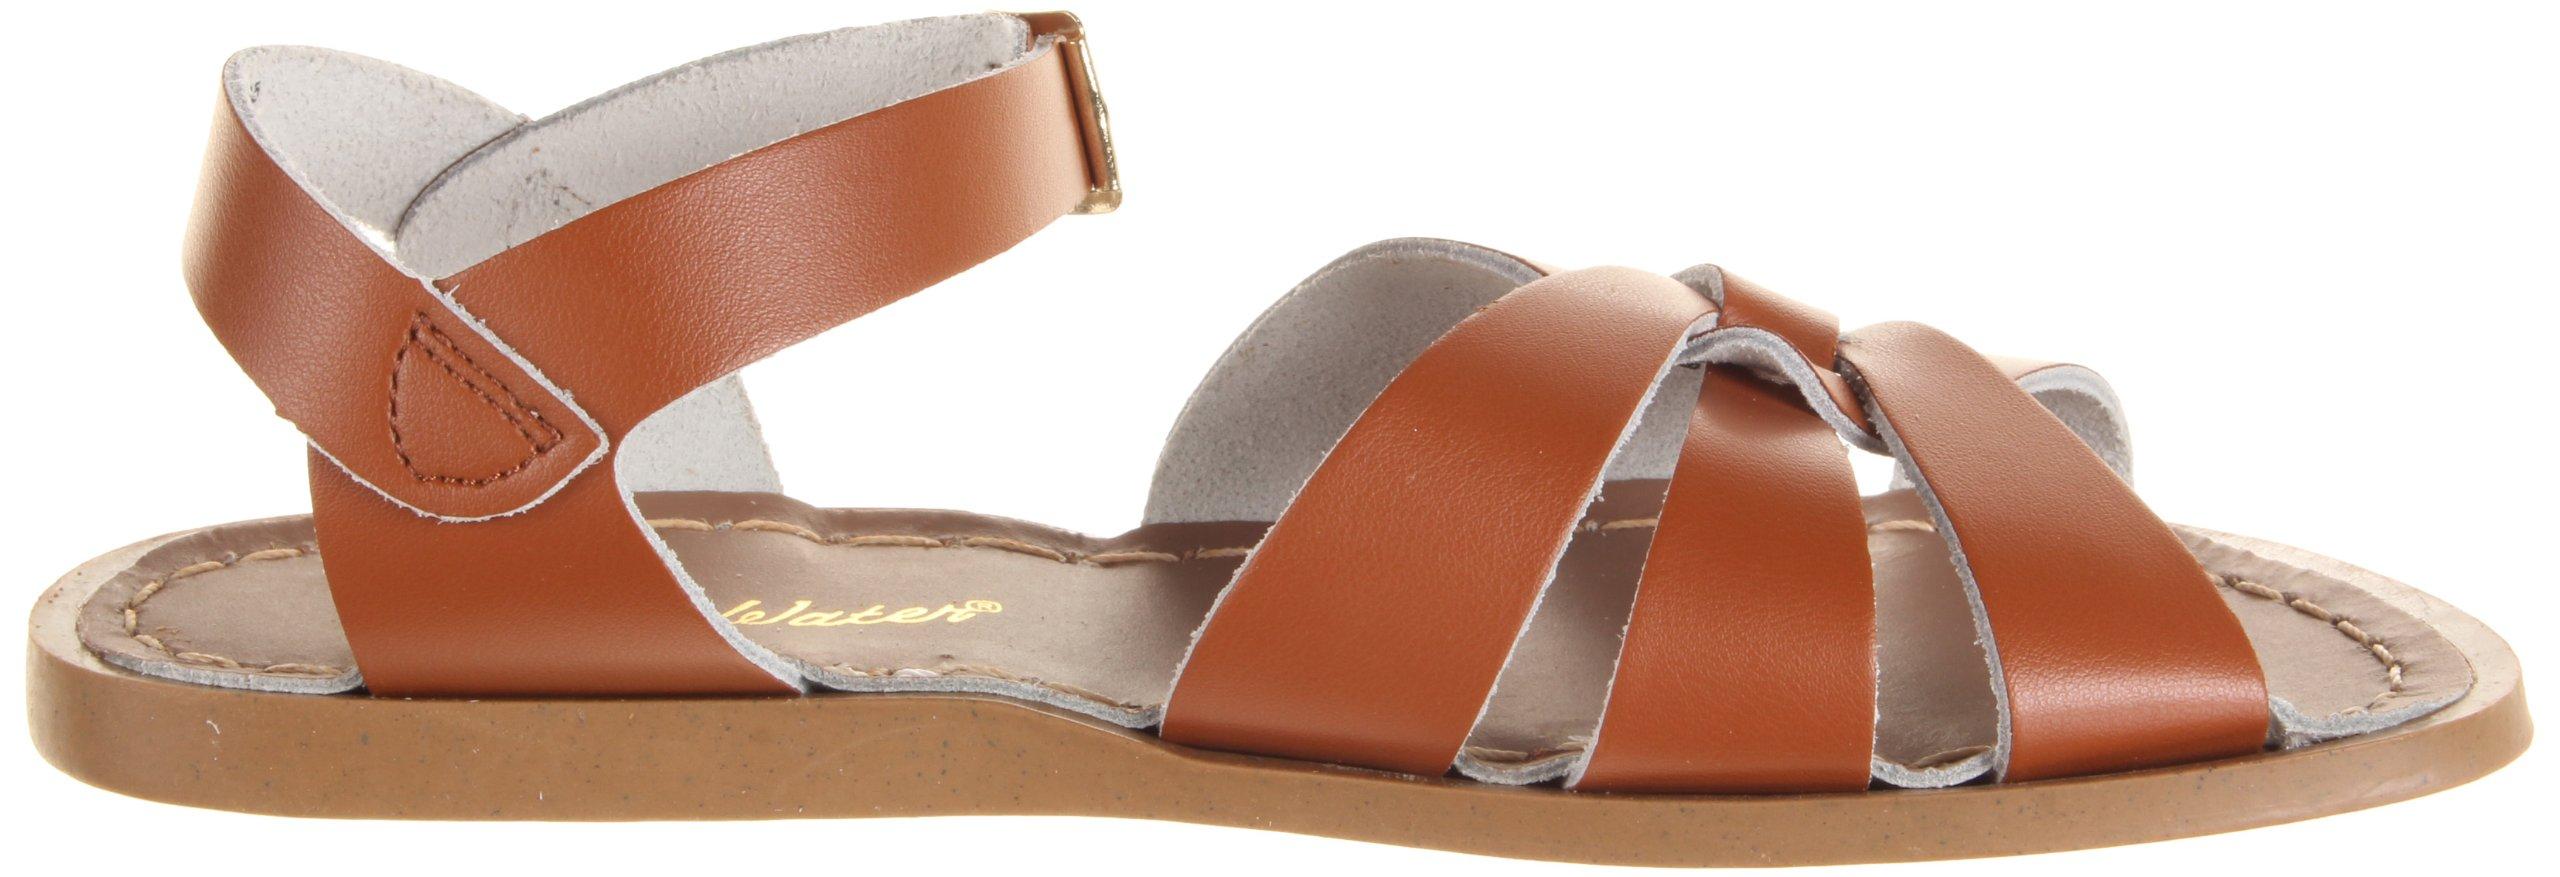 Salt Water Sandals by Hoy Shoe Original Sandal (Toddler/Little Kid/Big Kid/Women's), Tan, 7 M US Big Kid by Salt Water Sandals (Image #7)